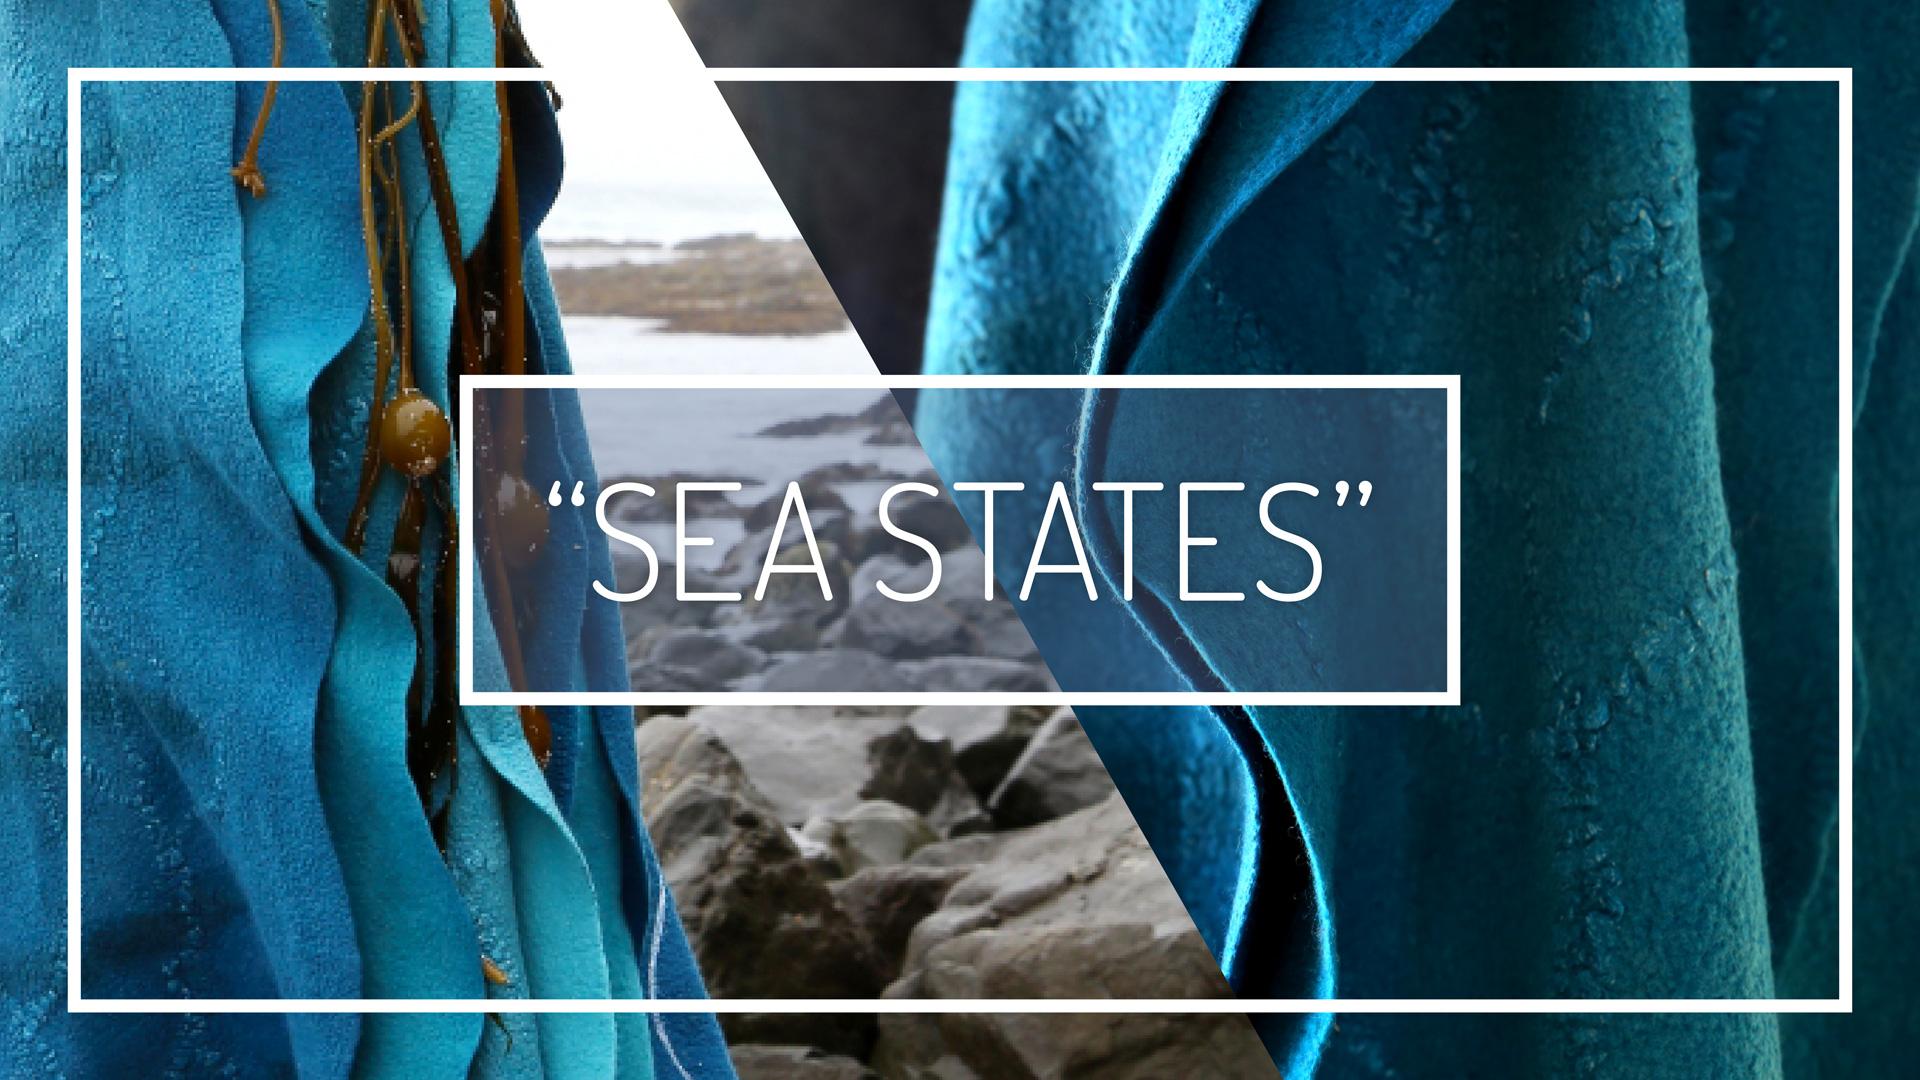 Sea States